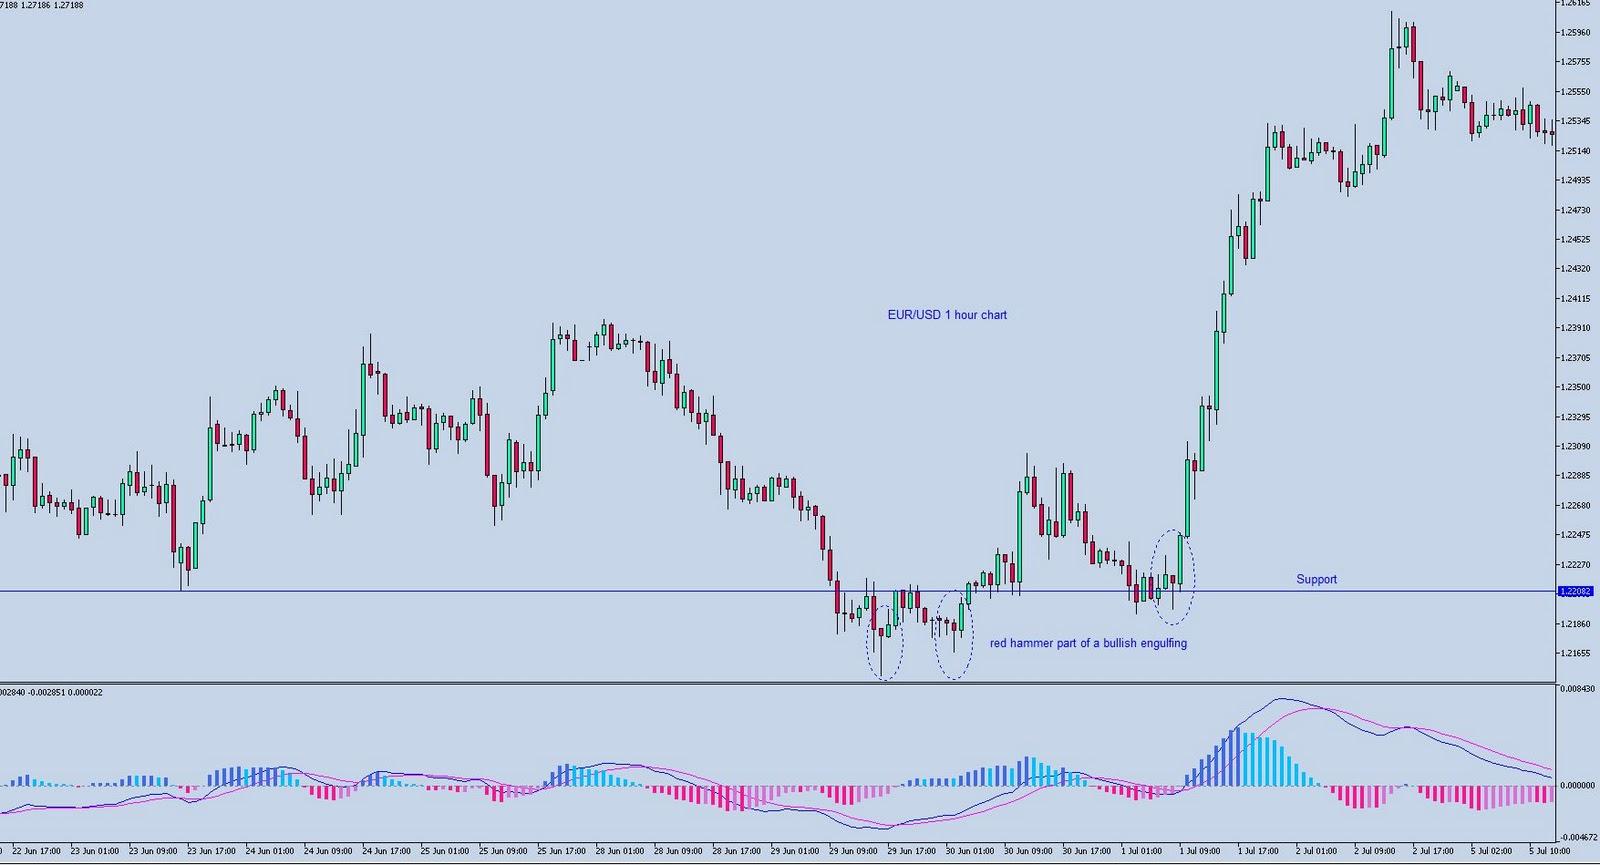 Fx53 trading system